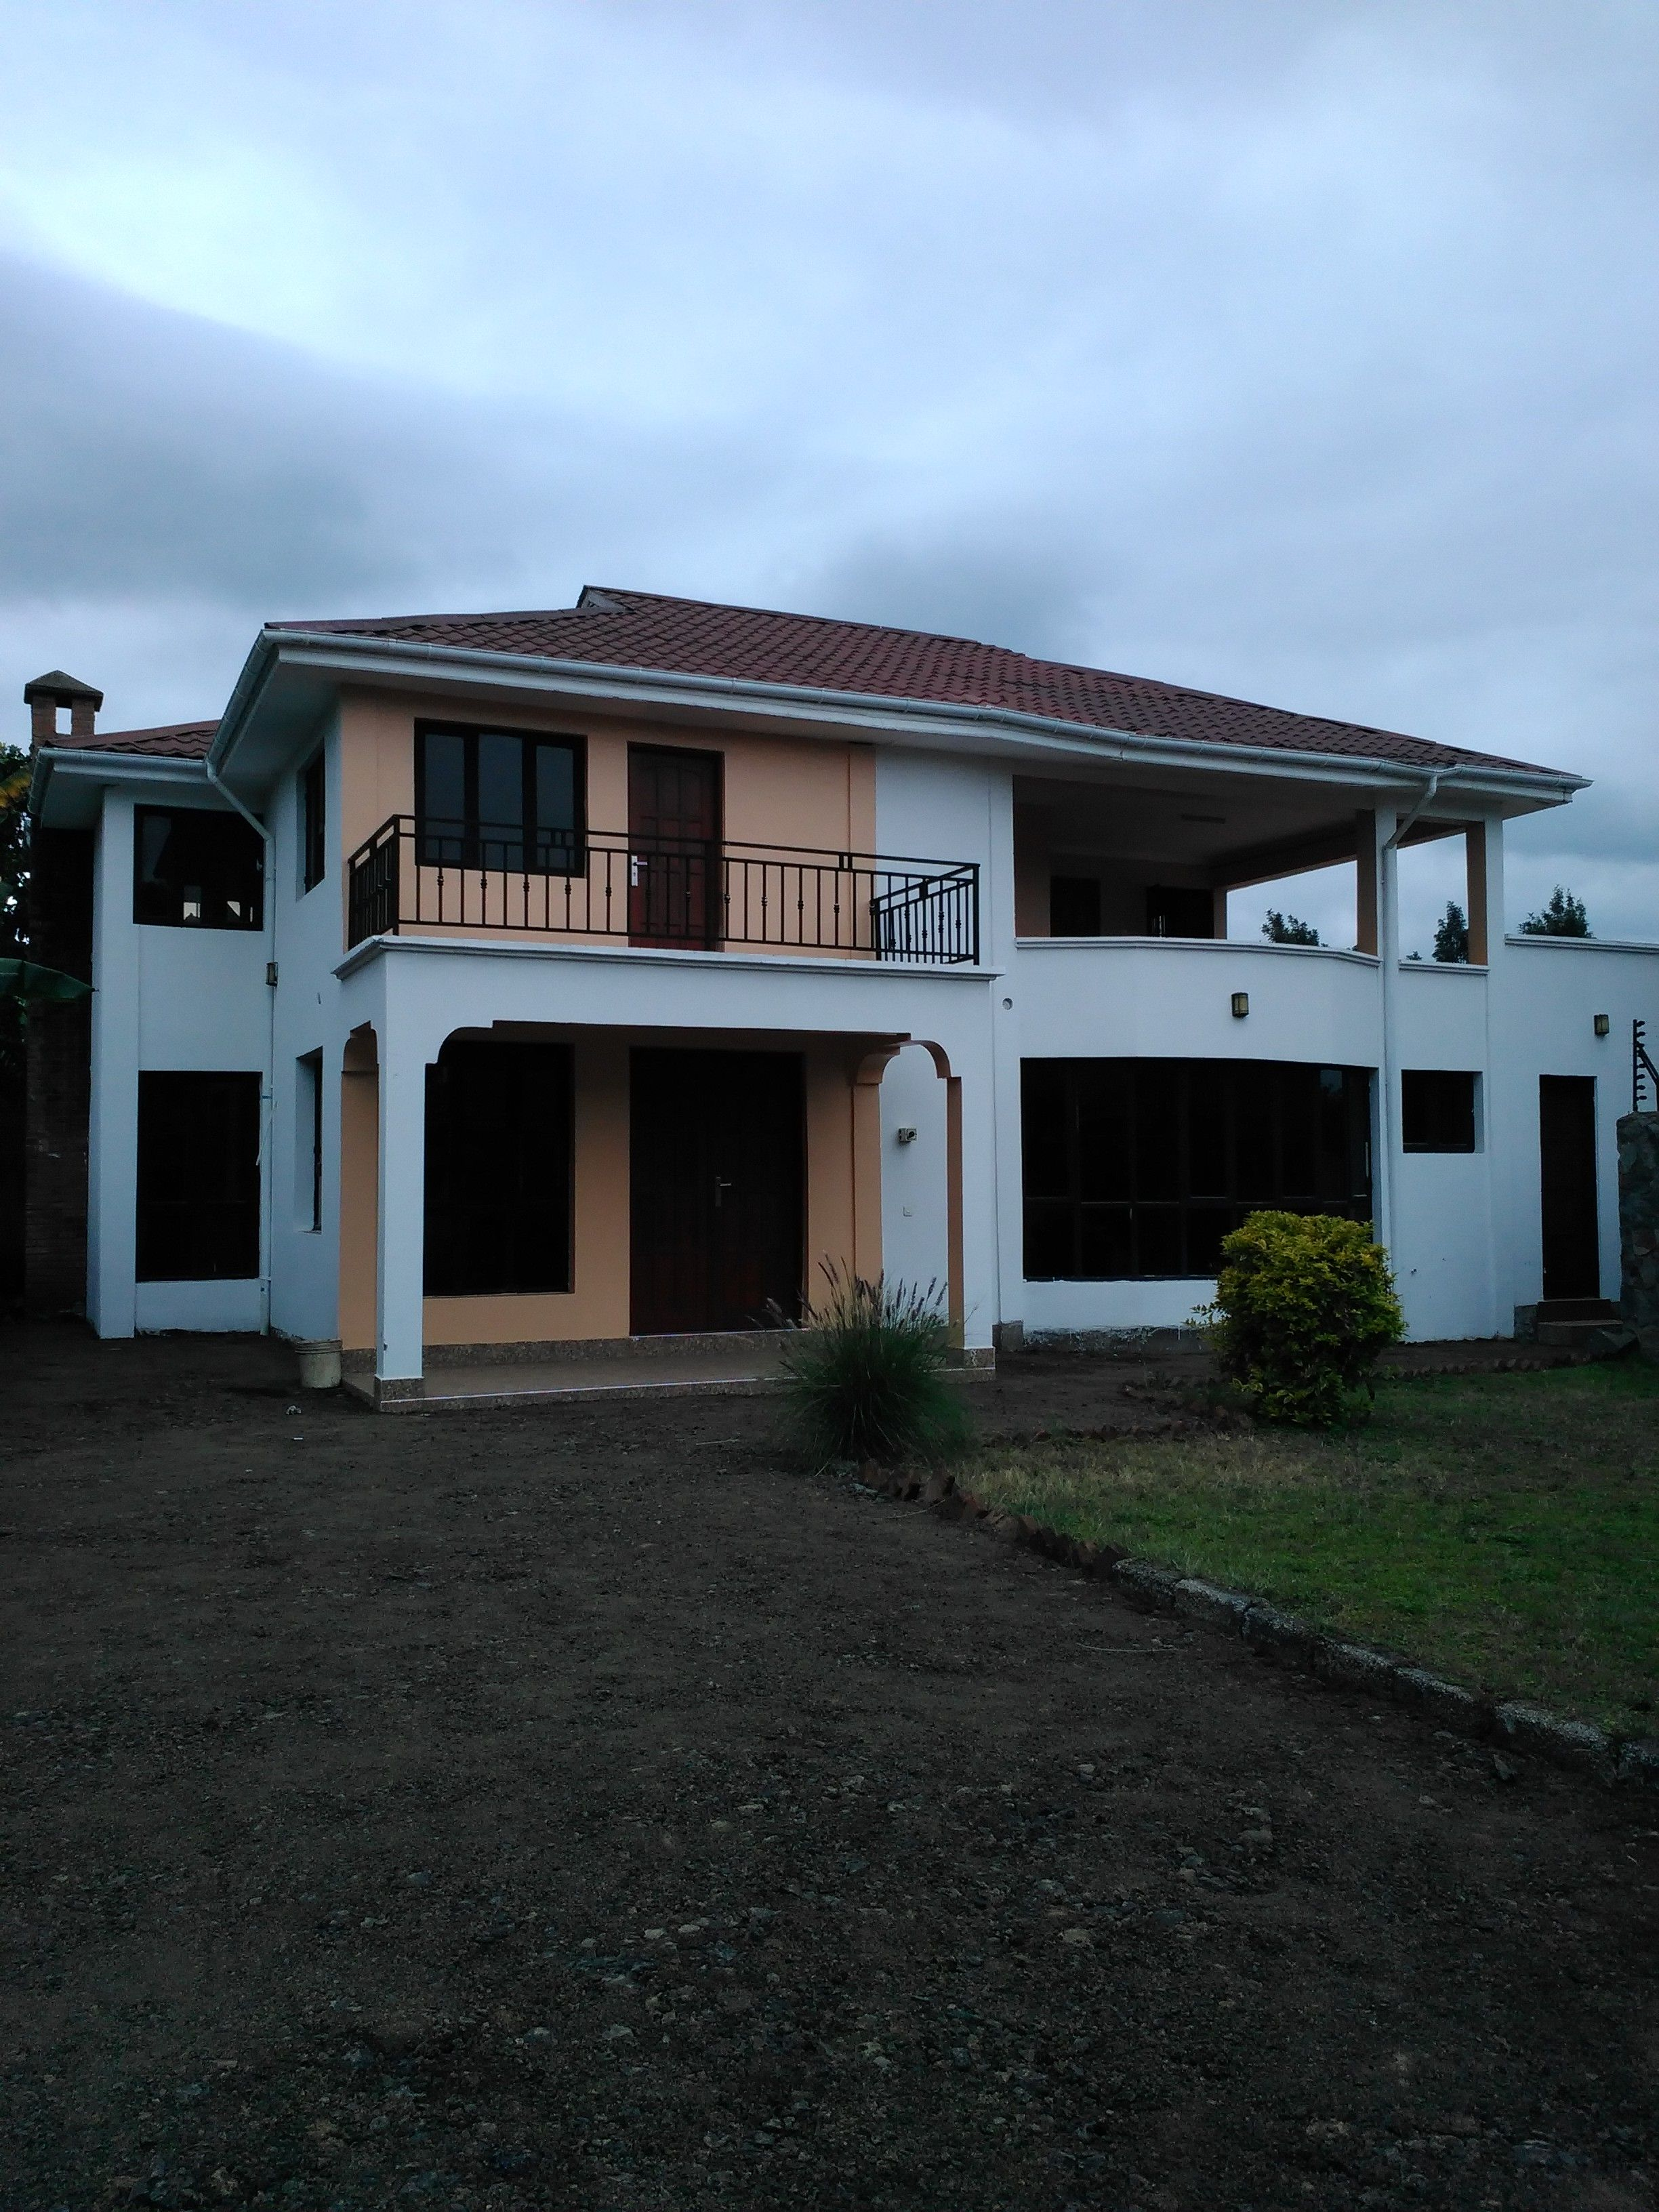 Sakina Arusha Houses For Rent 4 Bedroom House For Rent Sakina